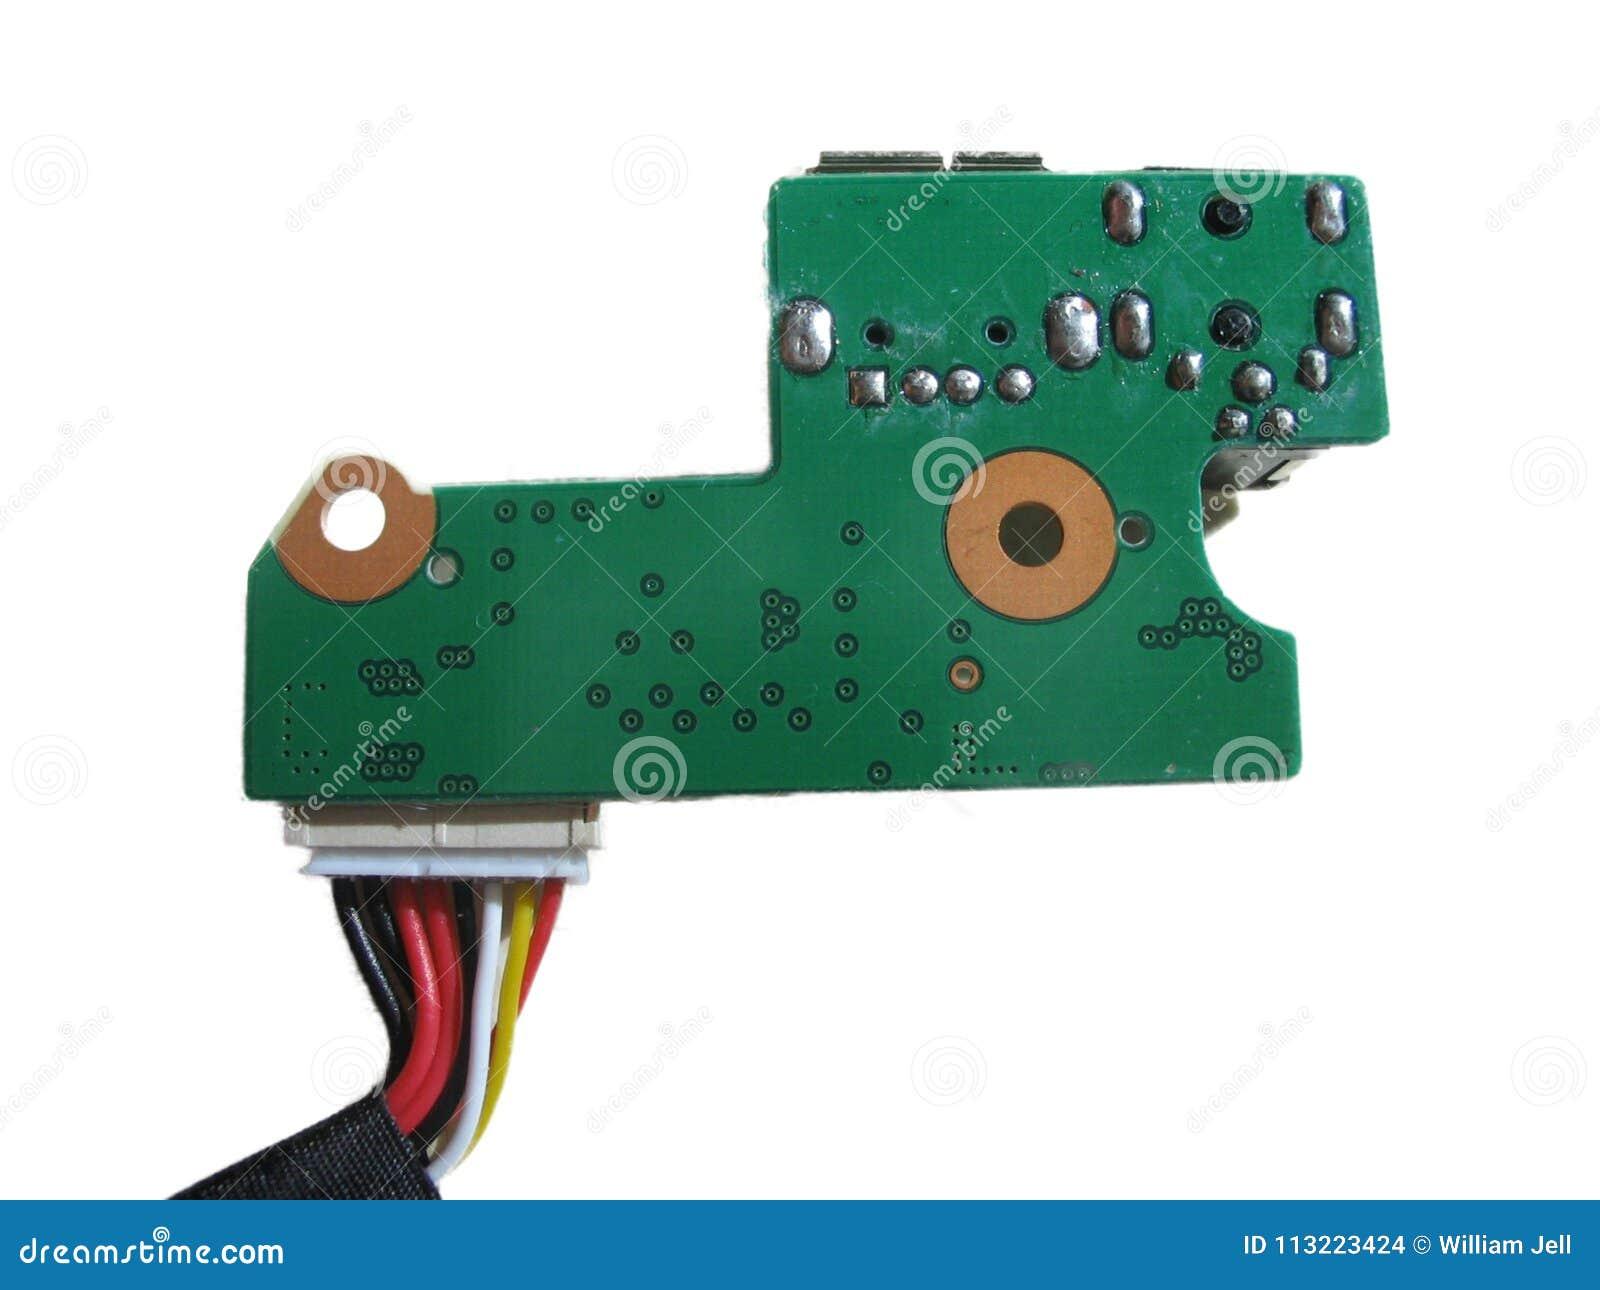 Wiring Harness Board